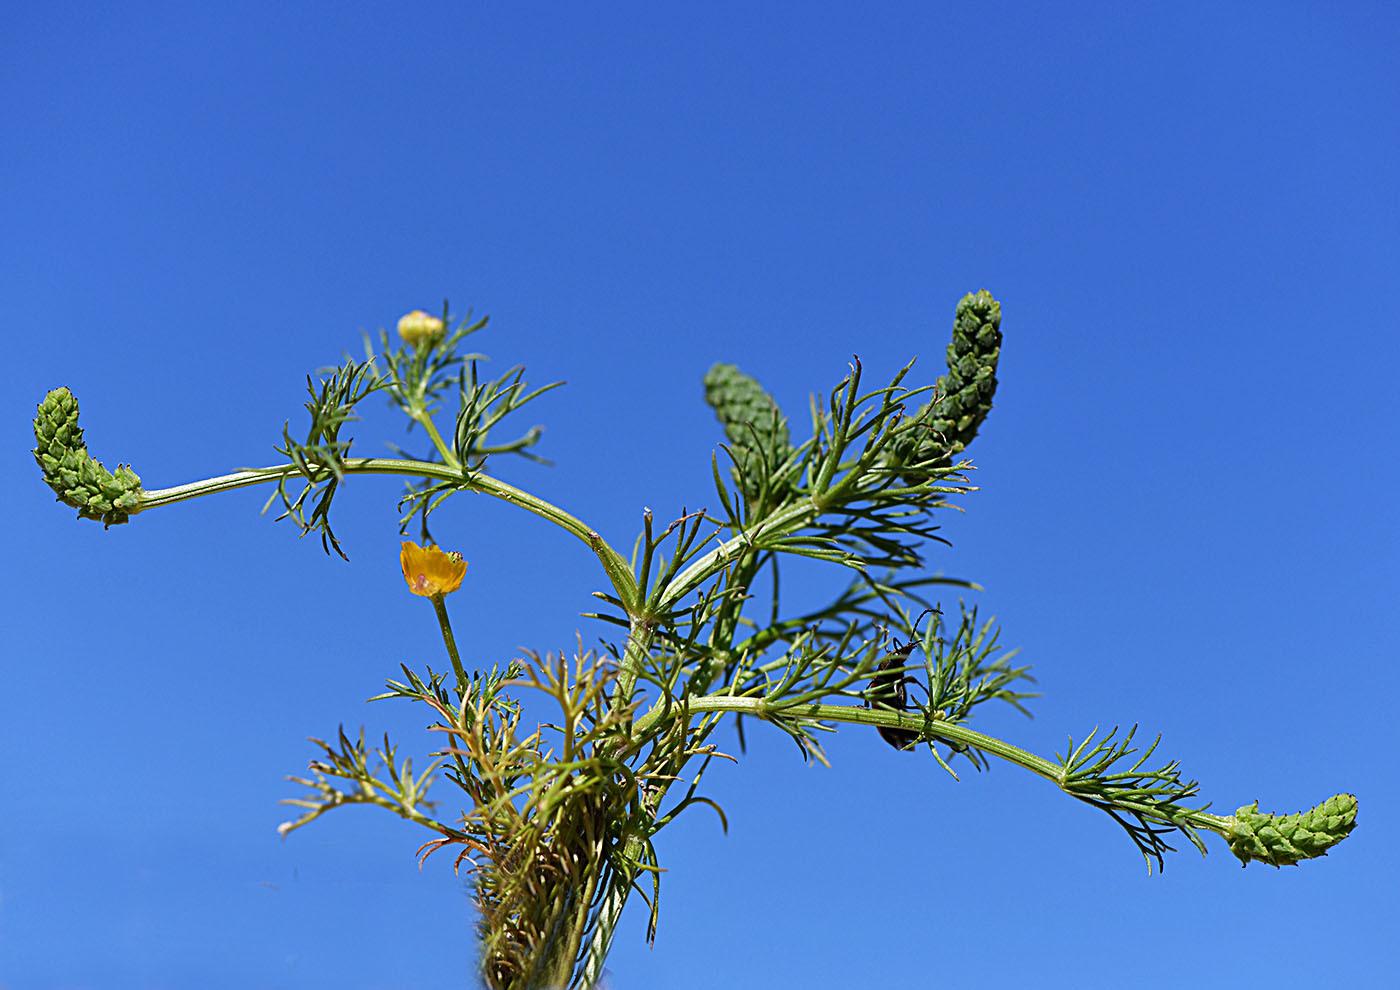 https://pictures.bgbm.org/digilib/Scaler?fn=Cyprus/Adonis_dentata_C1.jpg&mo=file